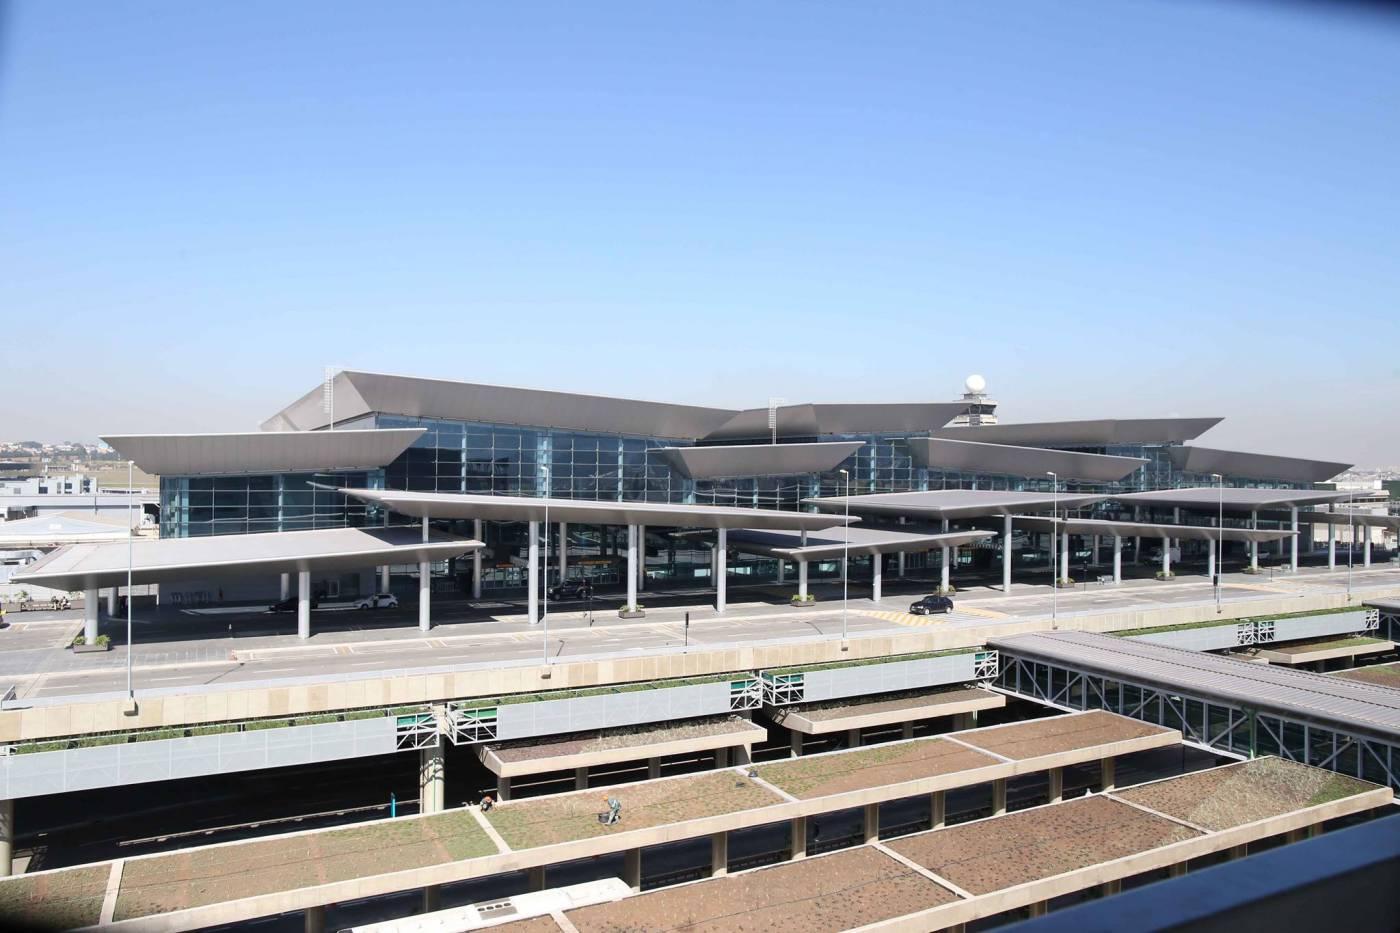 Aeroporto de Guarulhos GRU Airport São Paulo